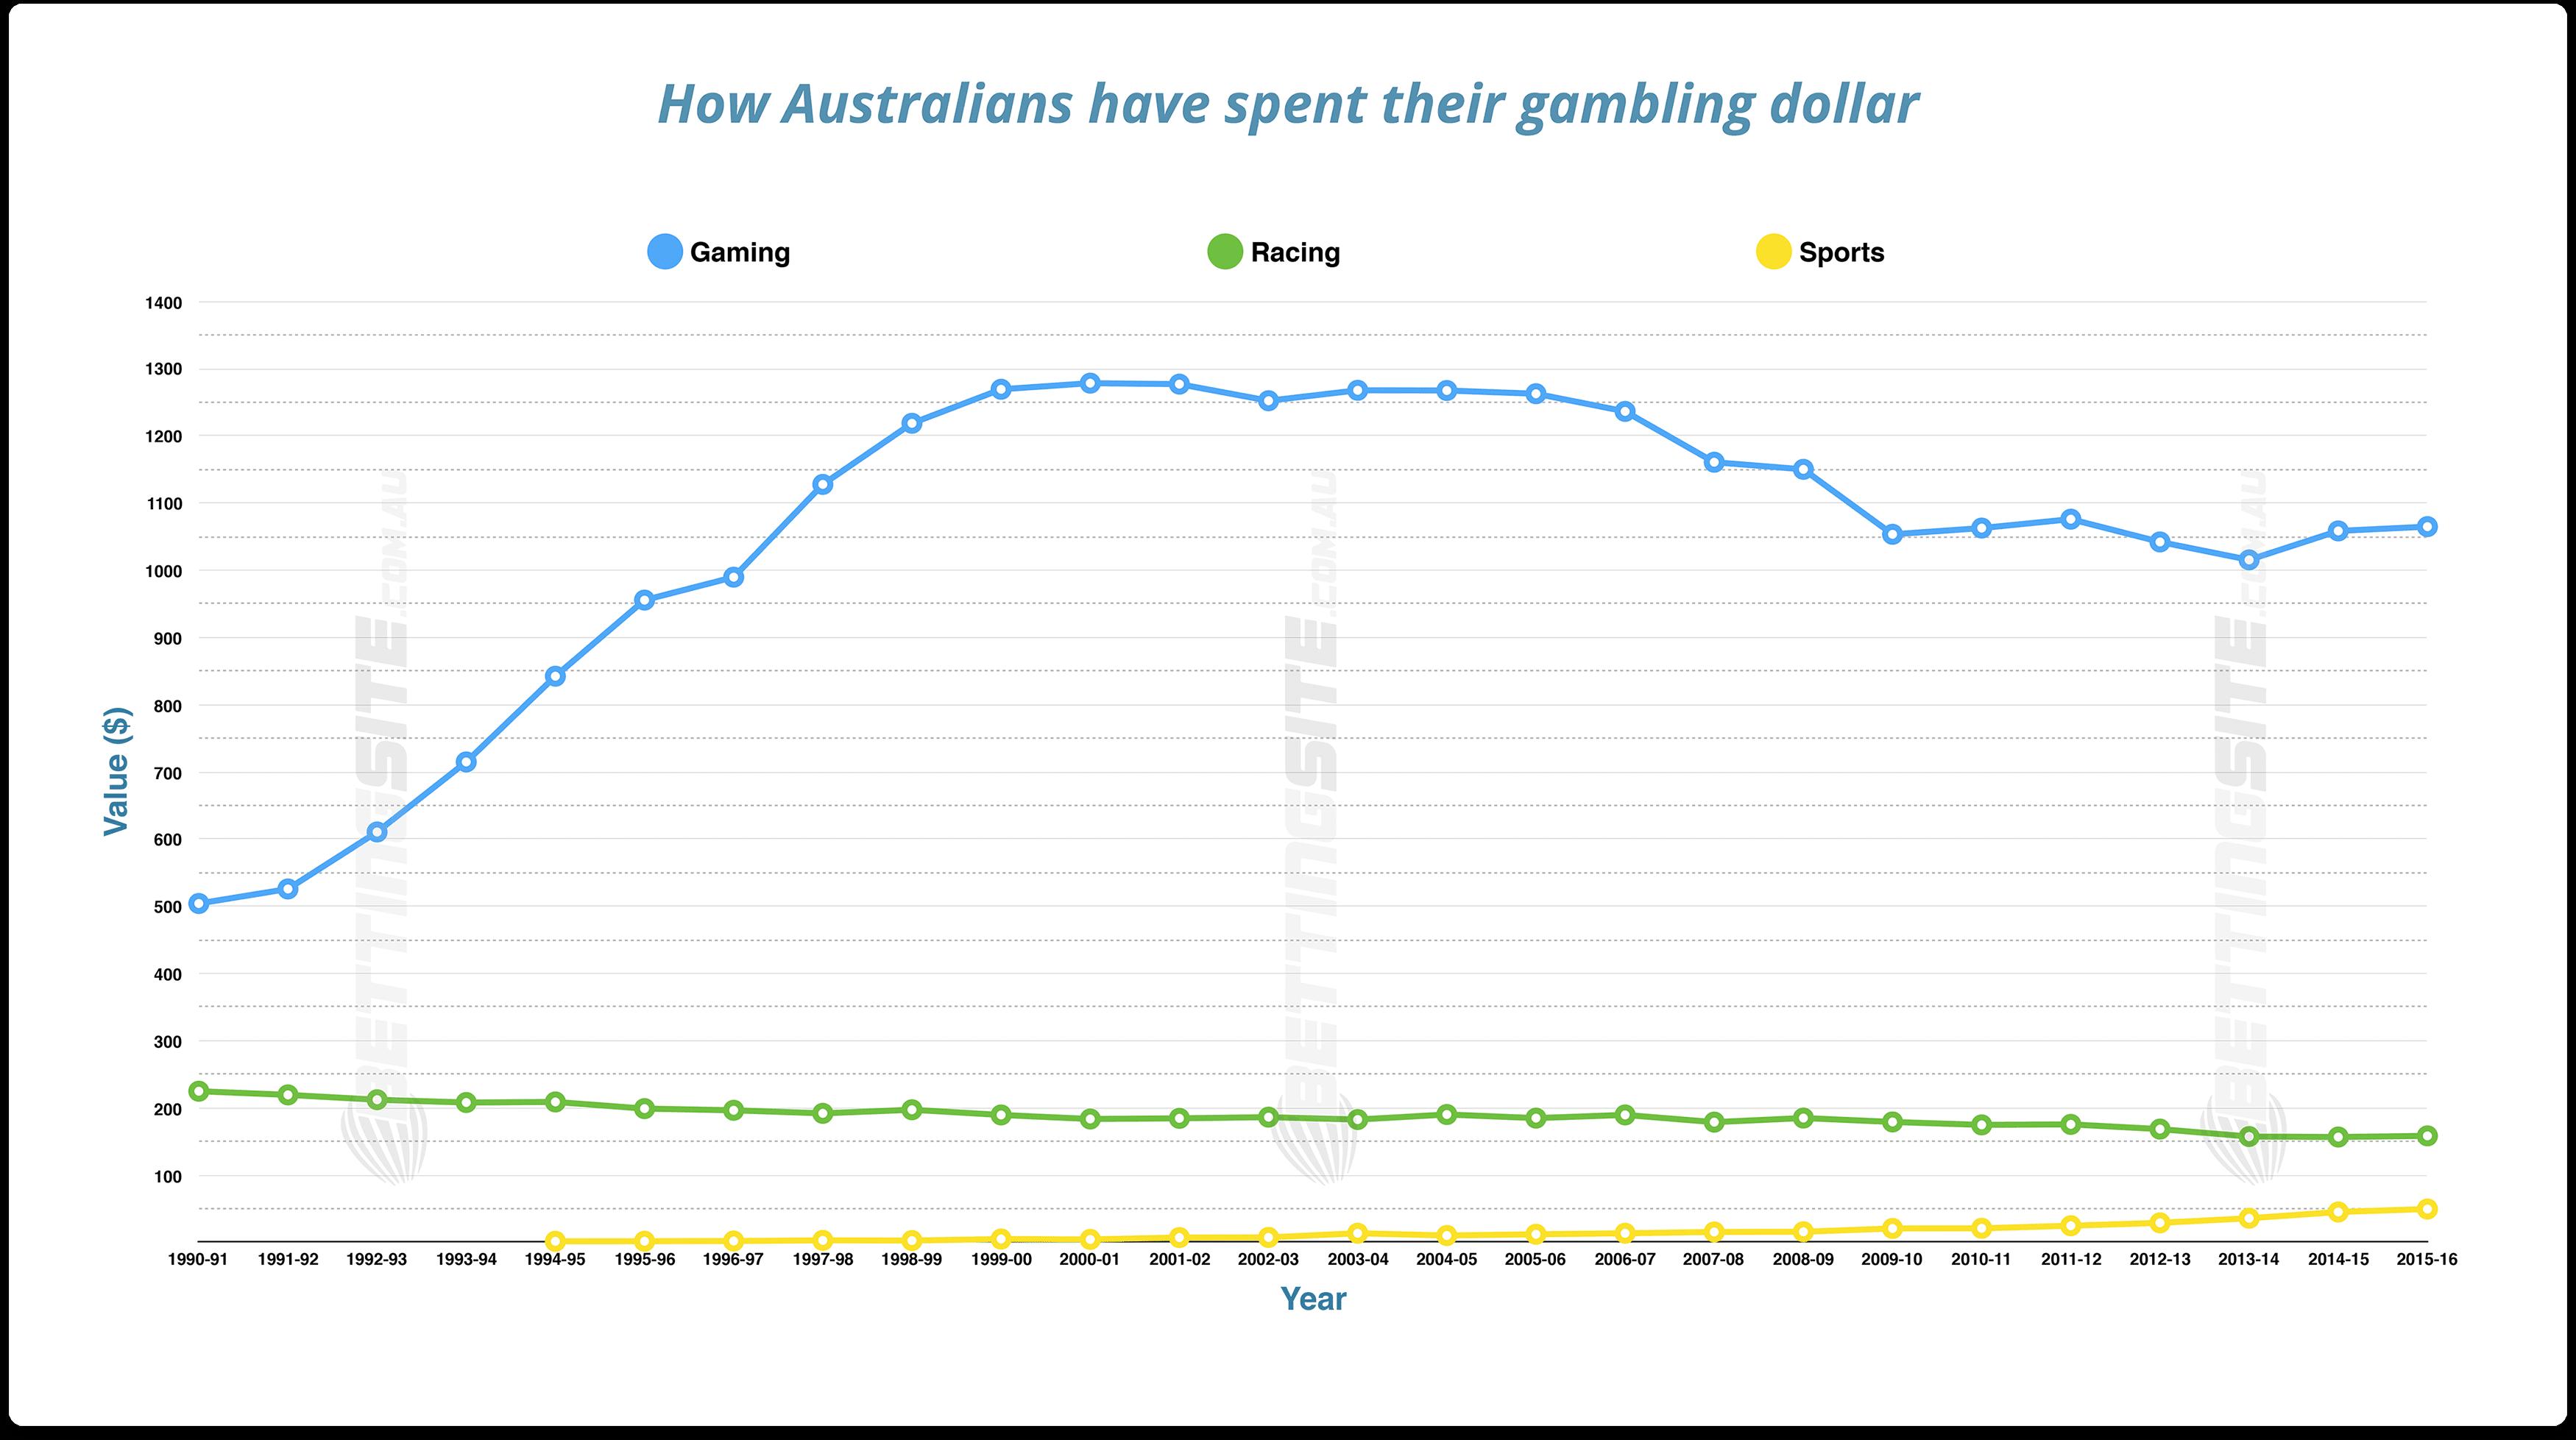 Australian gambling figures